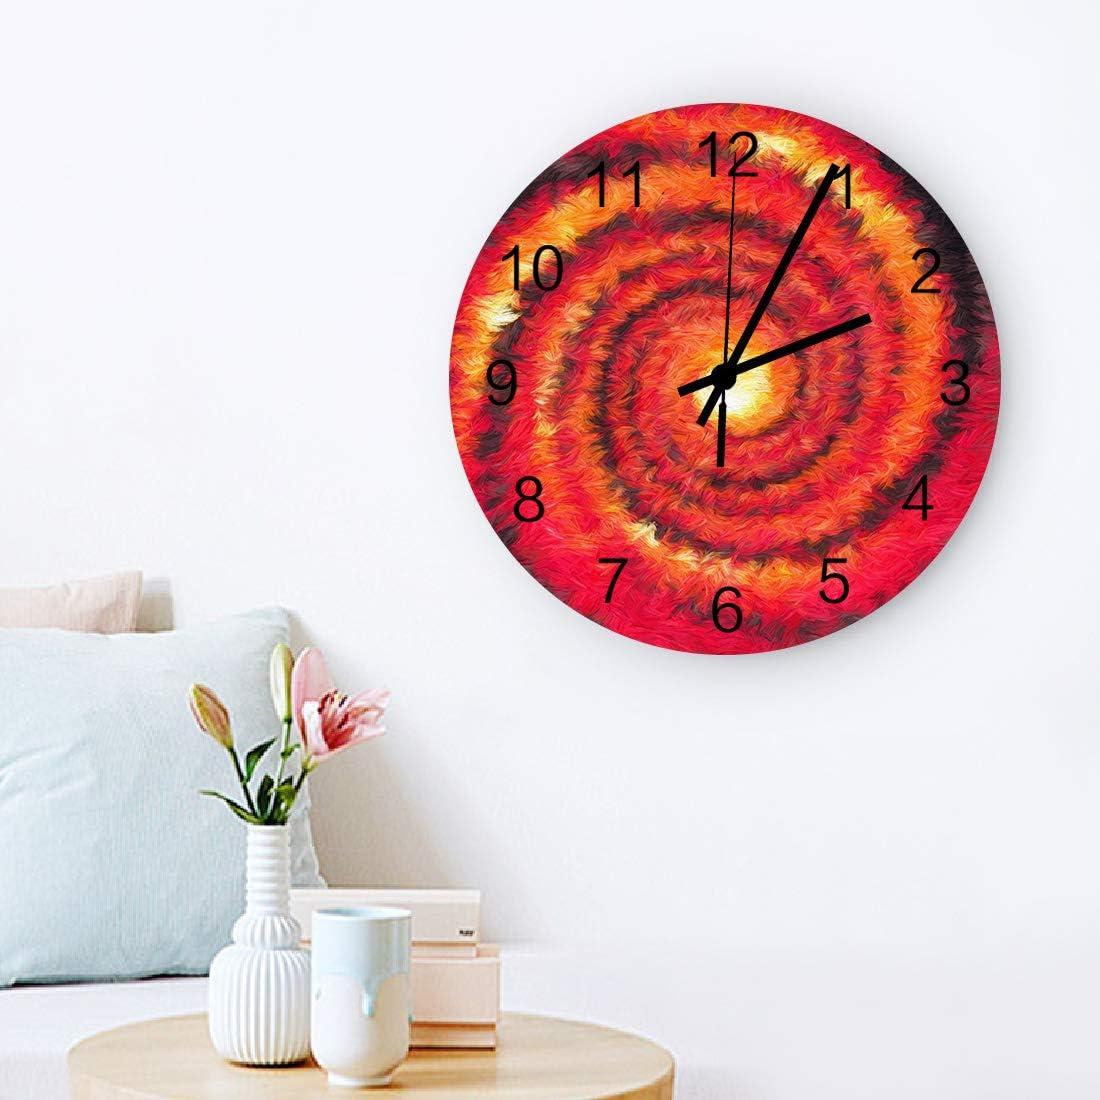 Amazon.com: MuswannaA Round Wooden Wall Clock 12 Inch